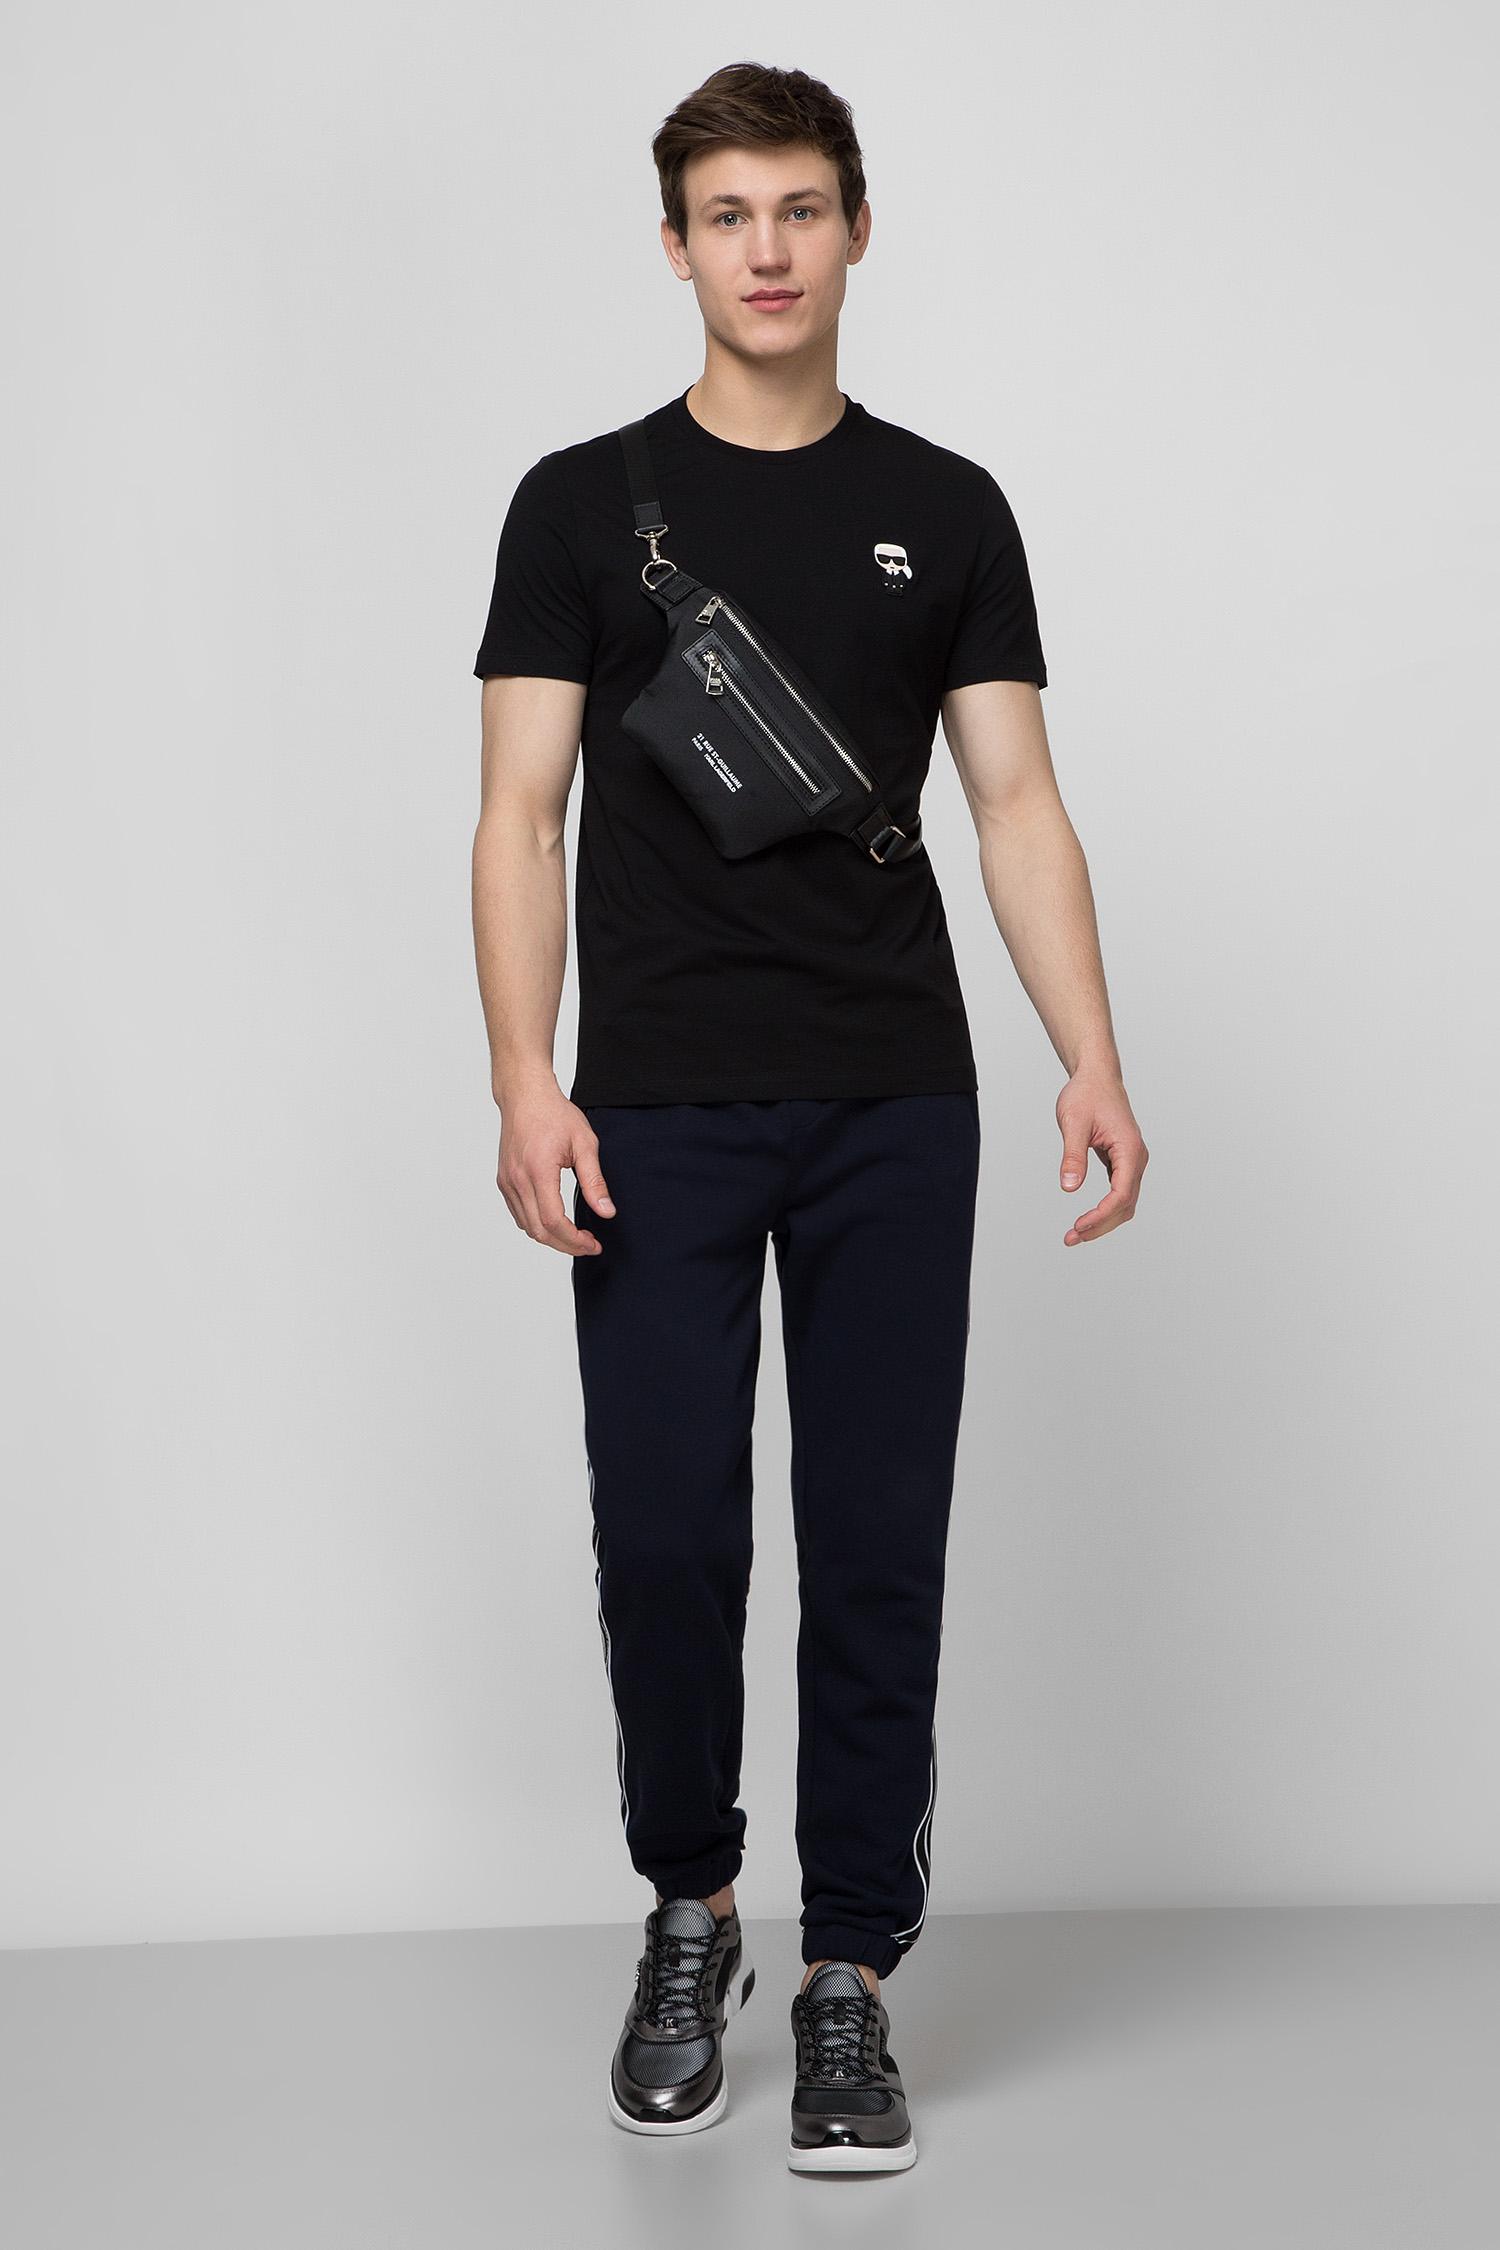 Мужские темно-синие спортивные брюки Karl Lagerfeld 501900.705030;690